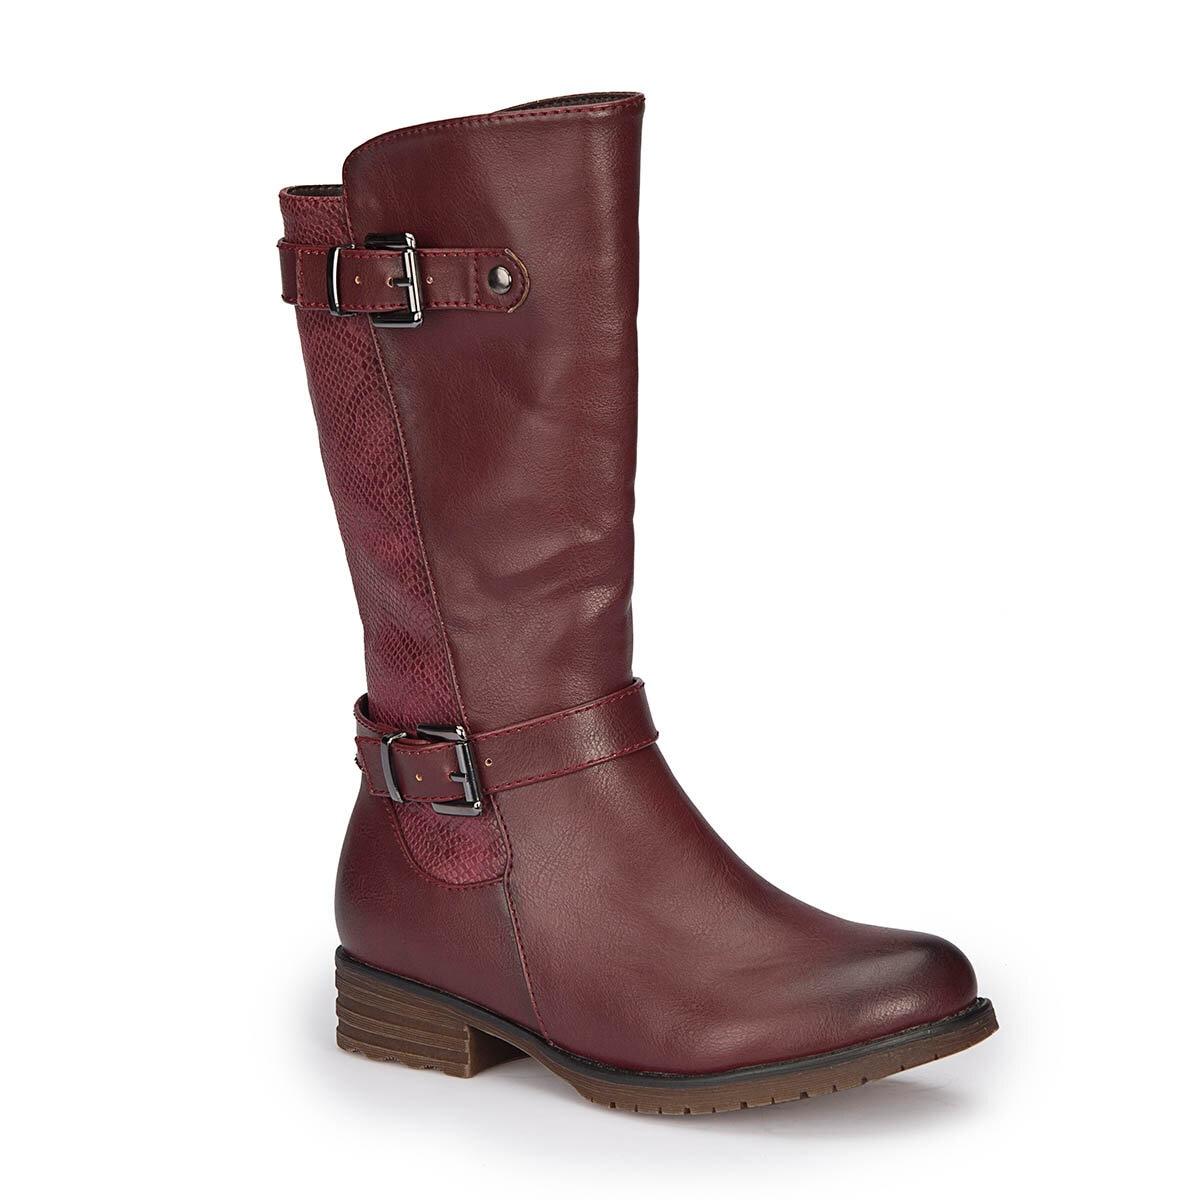 FLO 72.509707.F Burgundy Female Child Boots Polaris